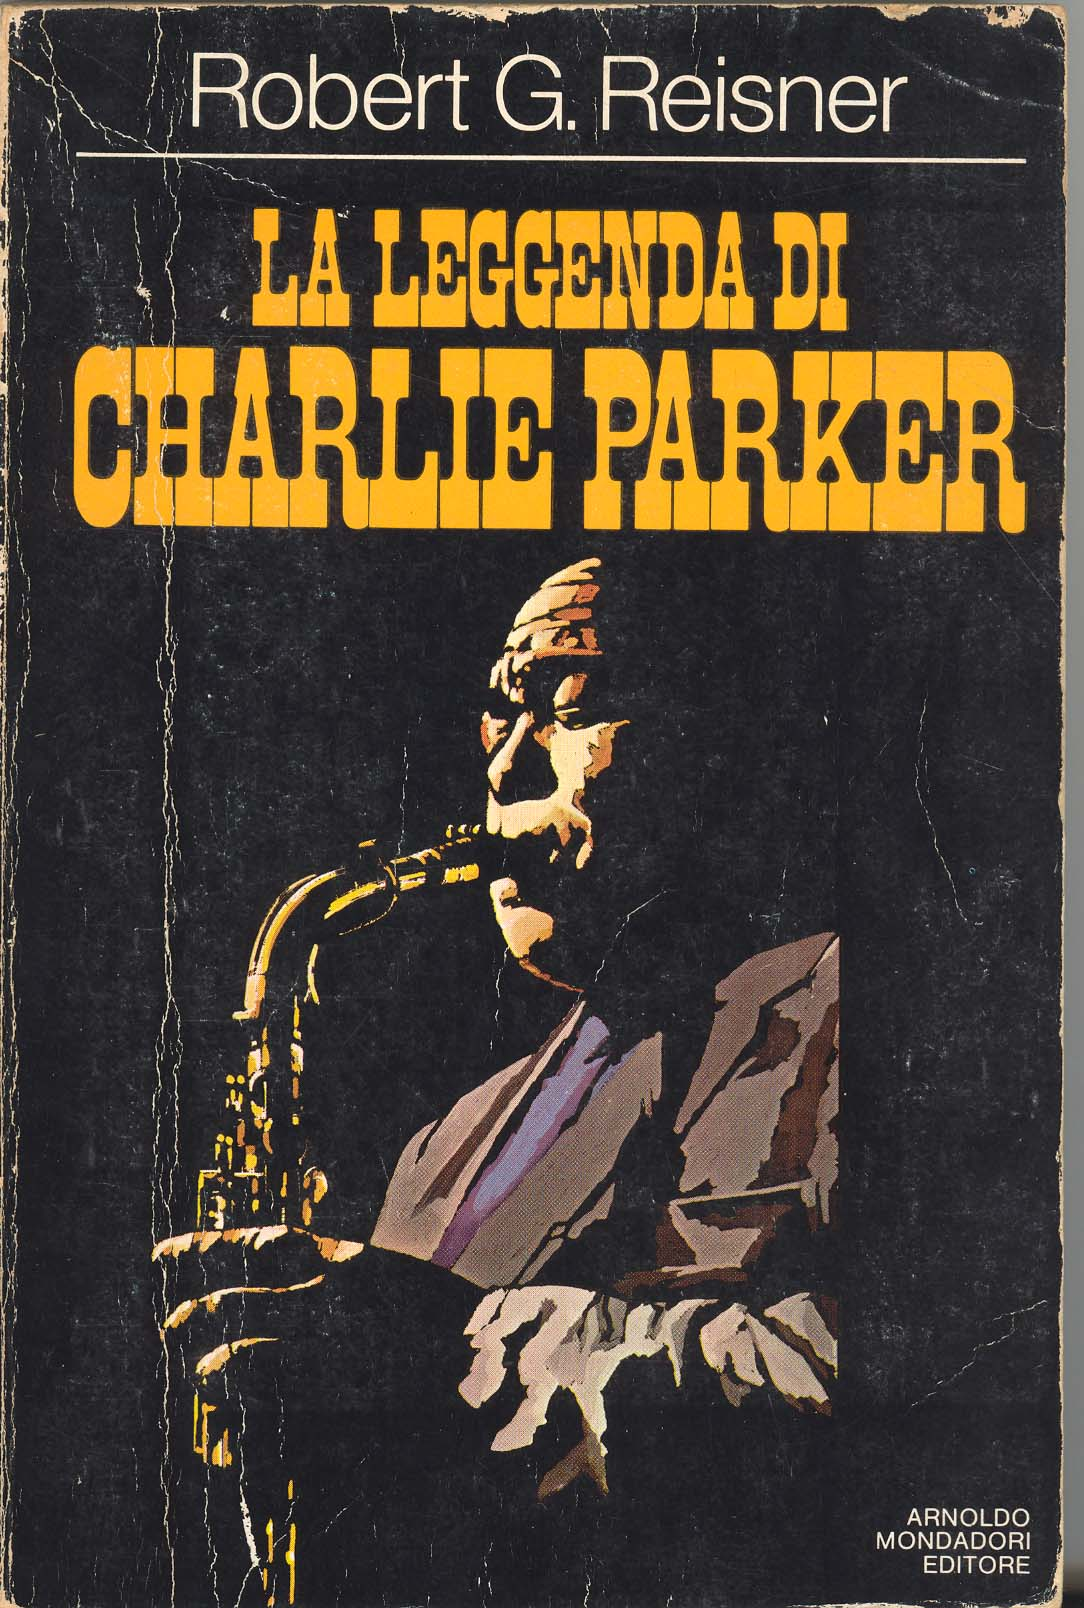 La leggenda di Charlie Parker